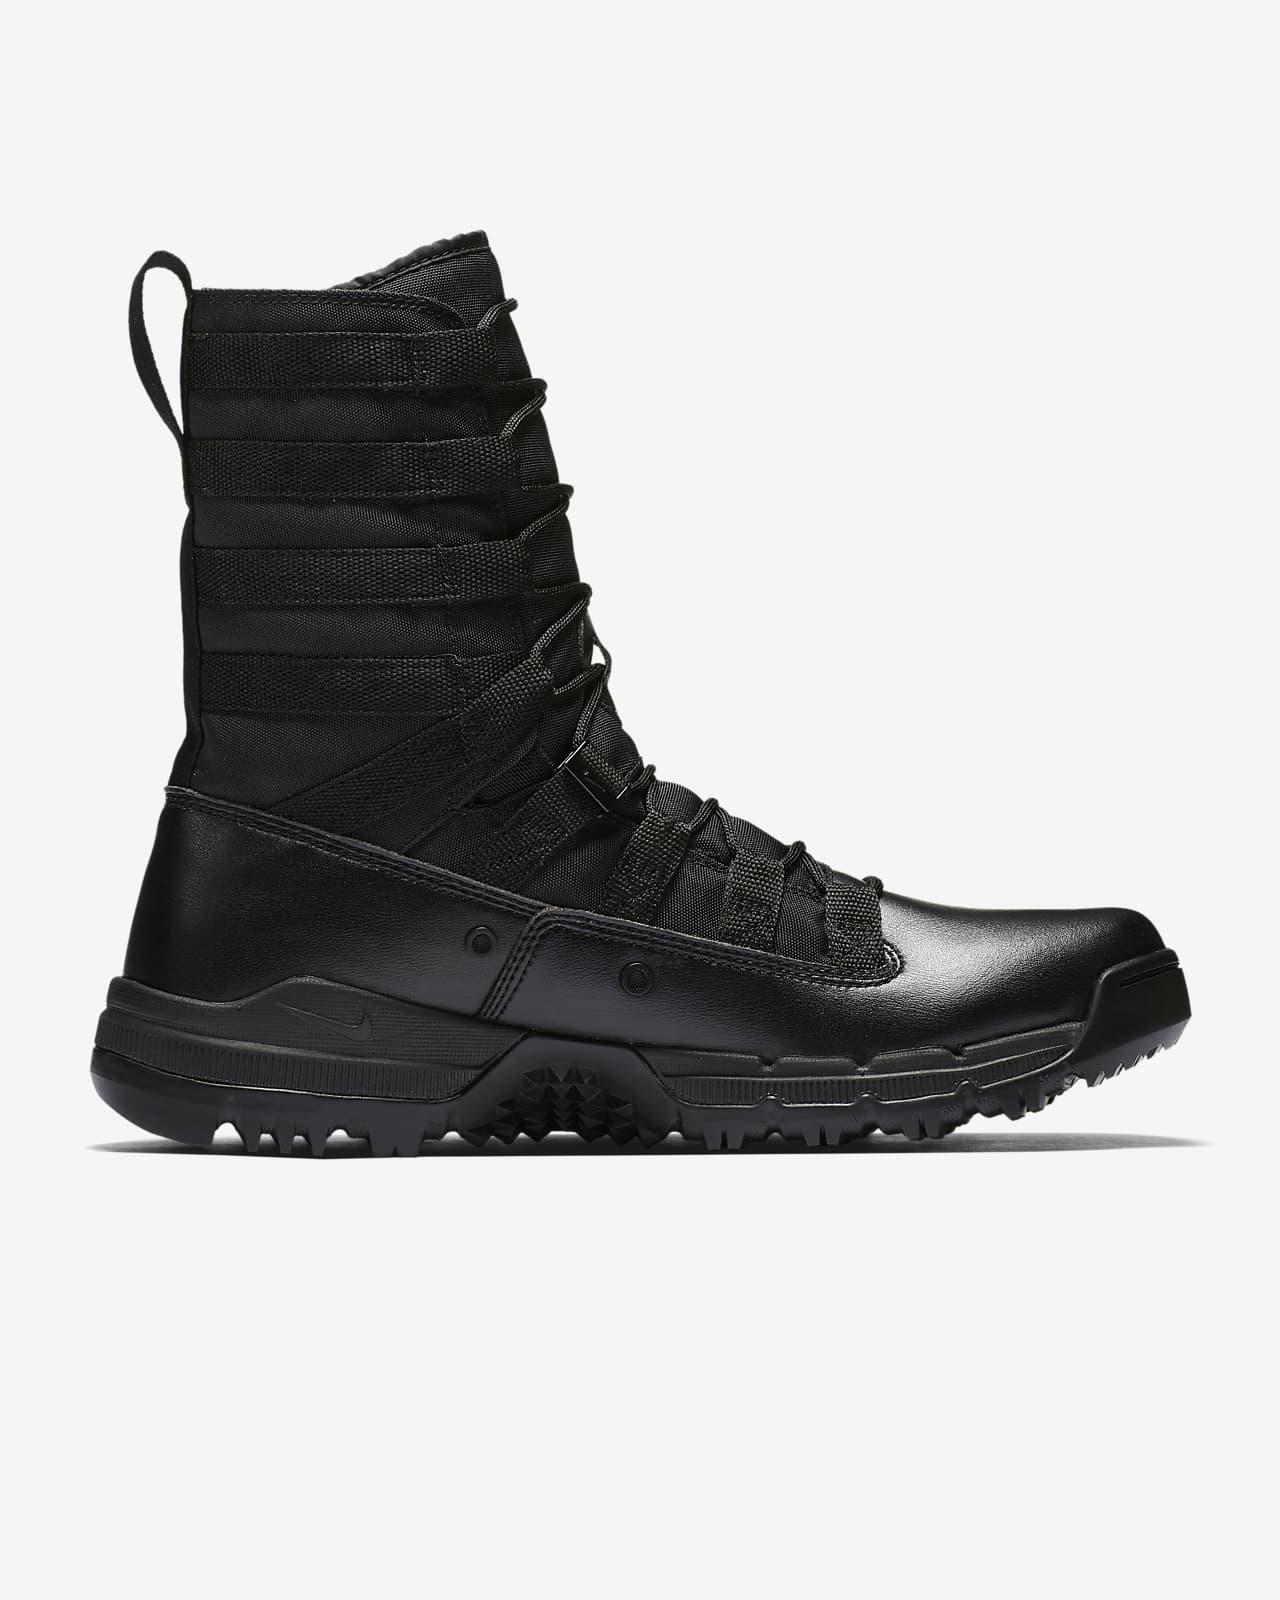 Nike SFB Gen 2 20cm (approx.) Tactical